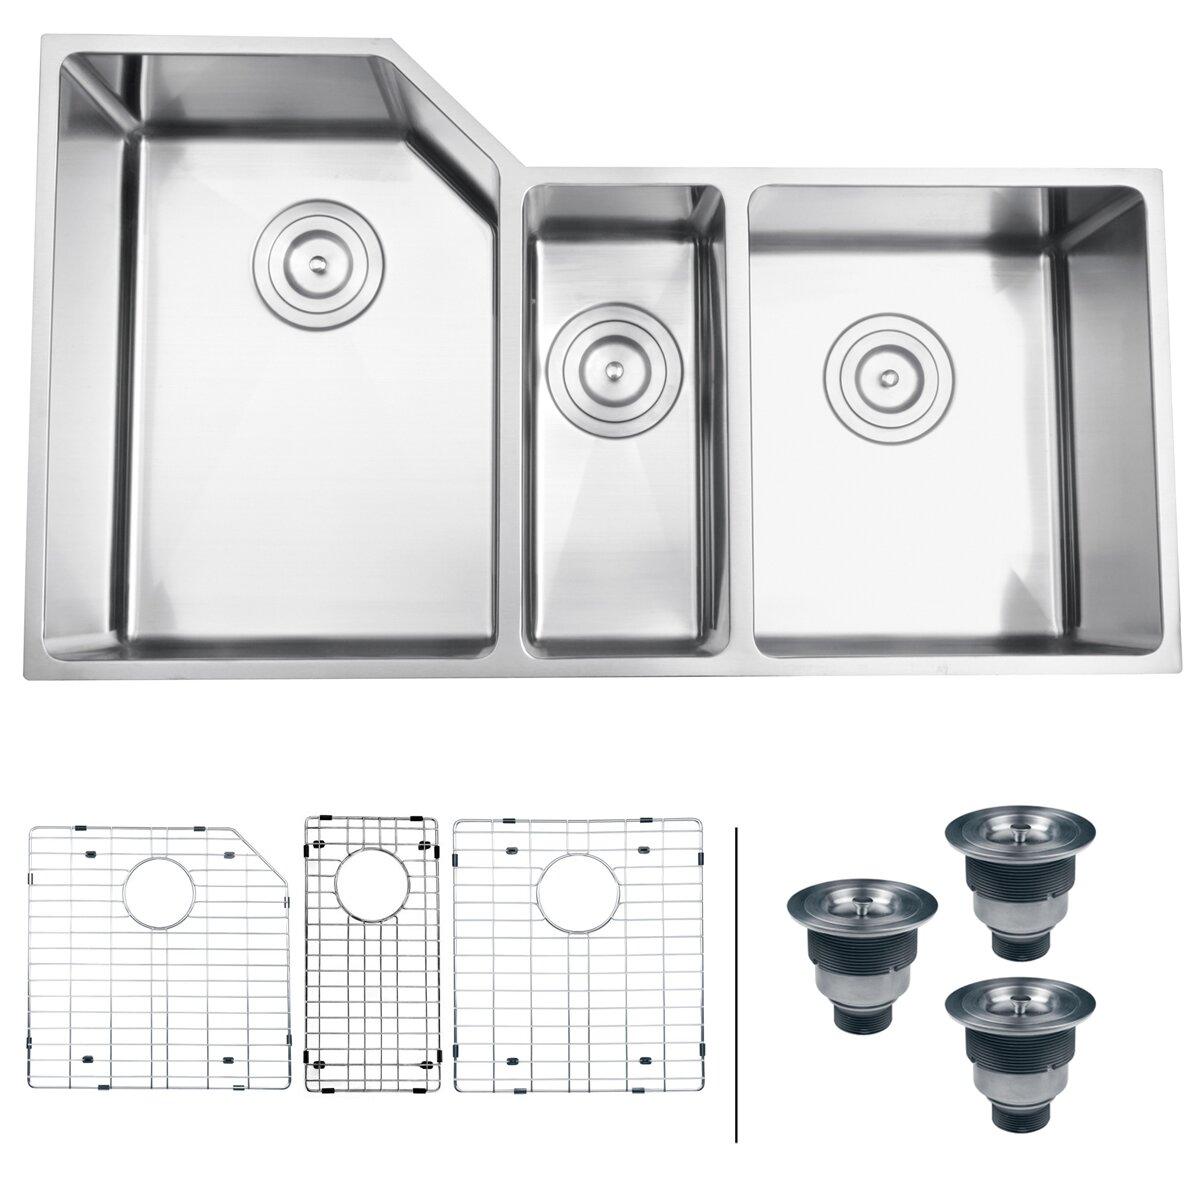 Ruvati Gravena X Undermount Triple Bowl Kitchen Sink Reviews Wayfair